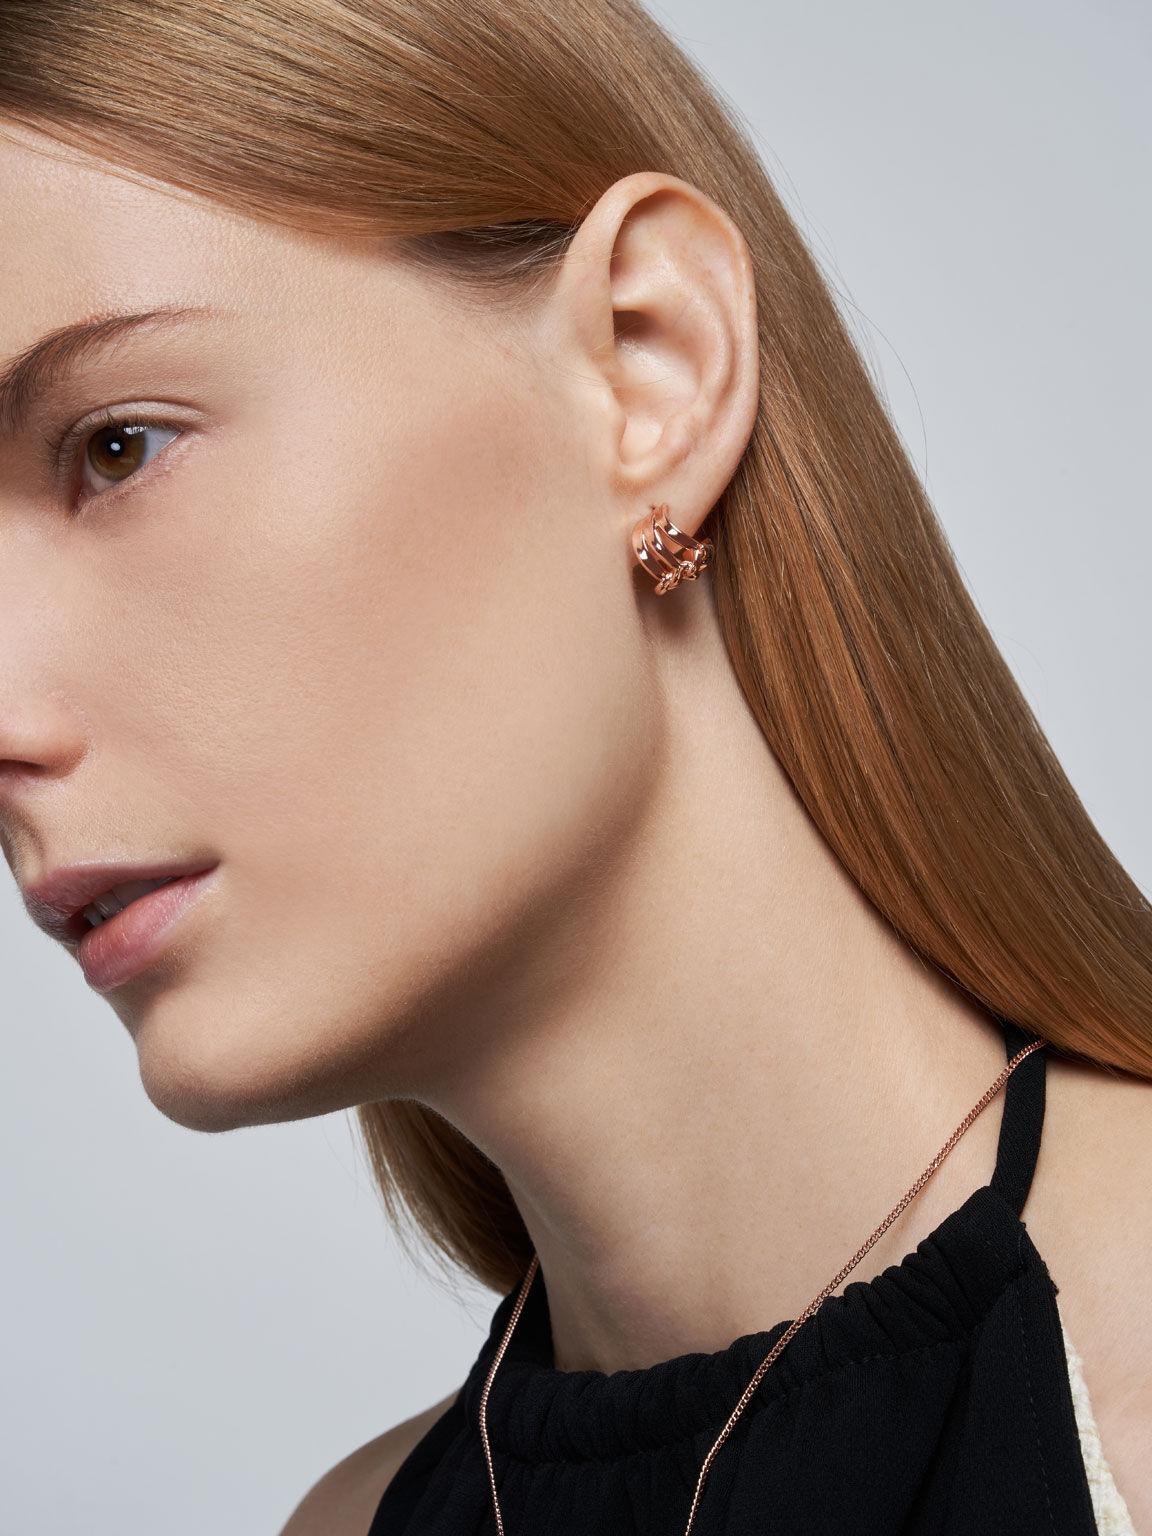 Sculptural Stud Earrings, Rose Gold, hi-res